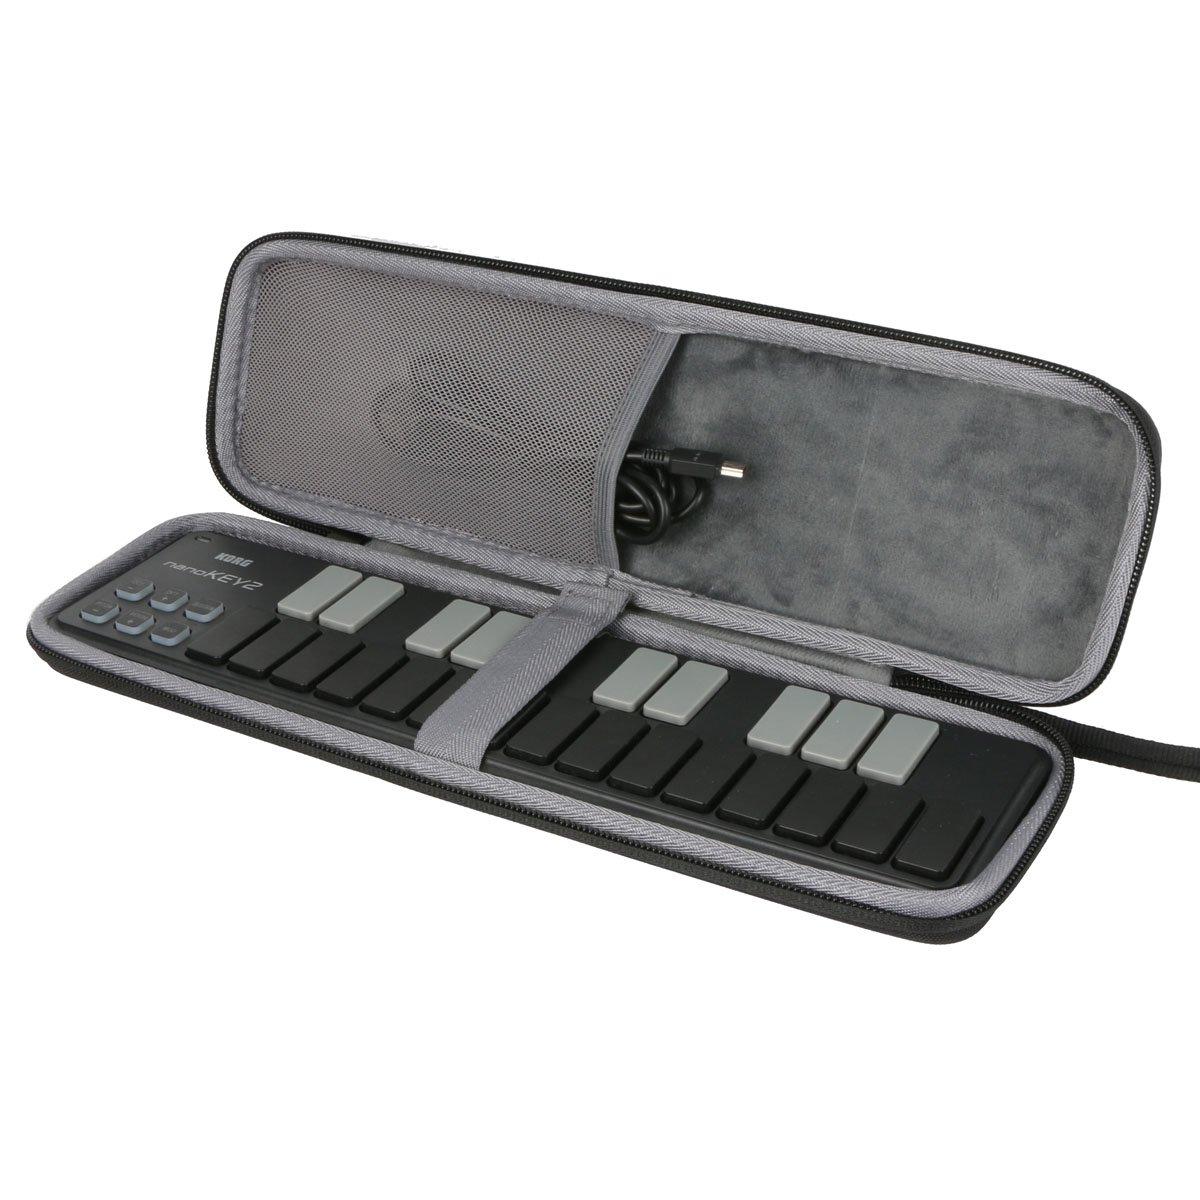 per Korg Nano Kontrol MIDI Keyboard//DJ Drum Pad// USB Controller Viaggiare Conservazione il Trasporto Valigia Scatola Borsa Costodie fits nanoKEY2 nanoPAD2 nanoKONTROL2 di CO2CRERA